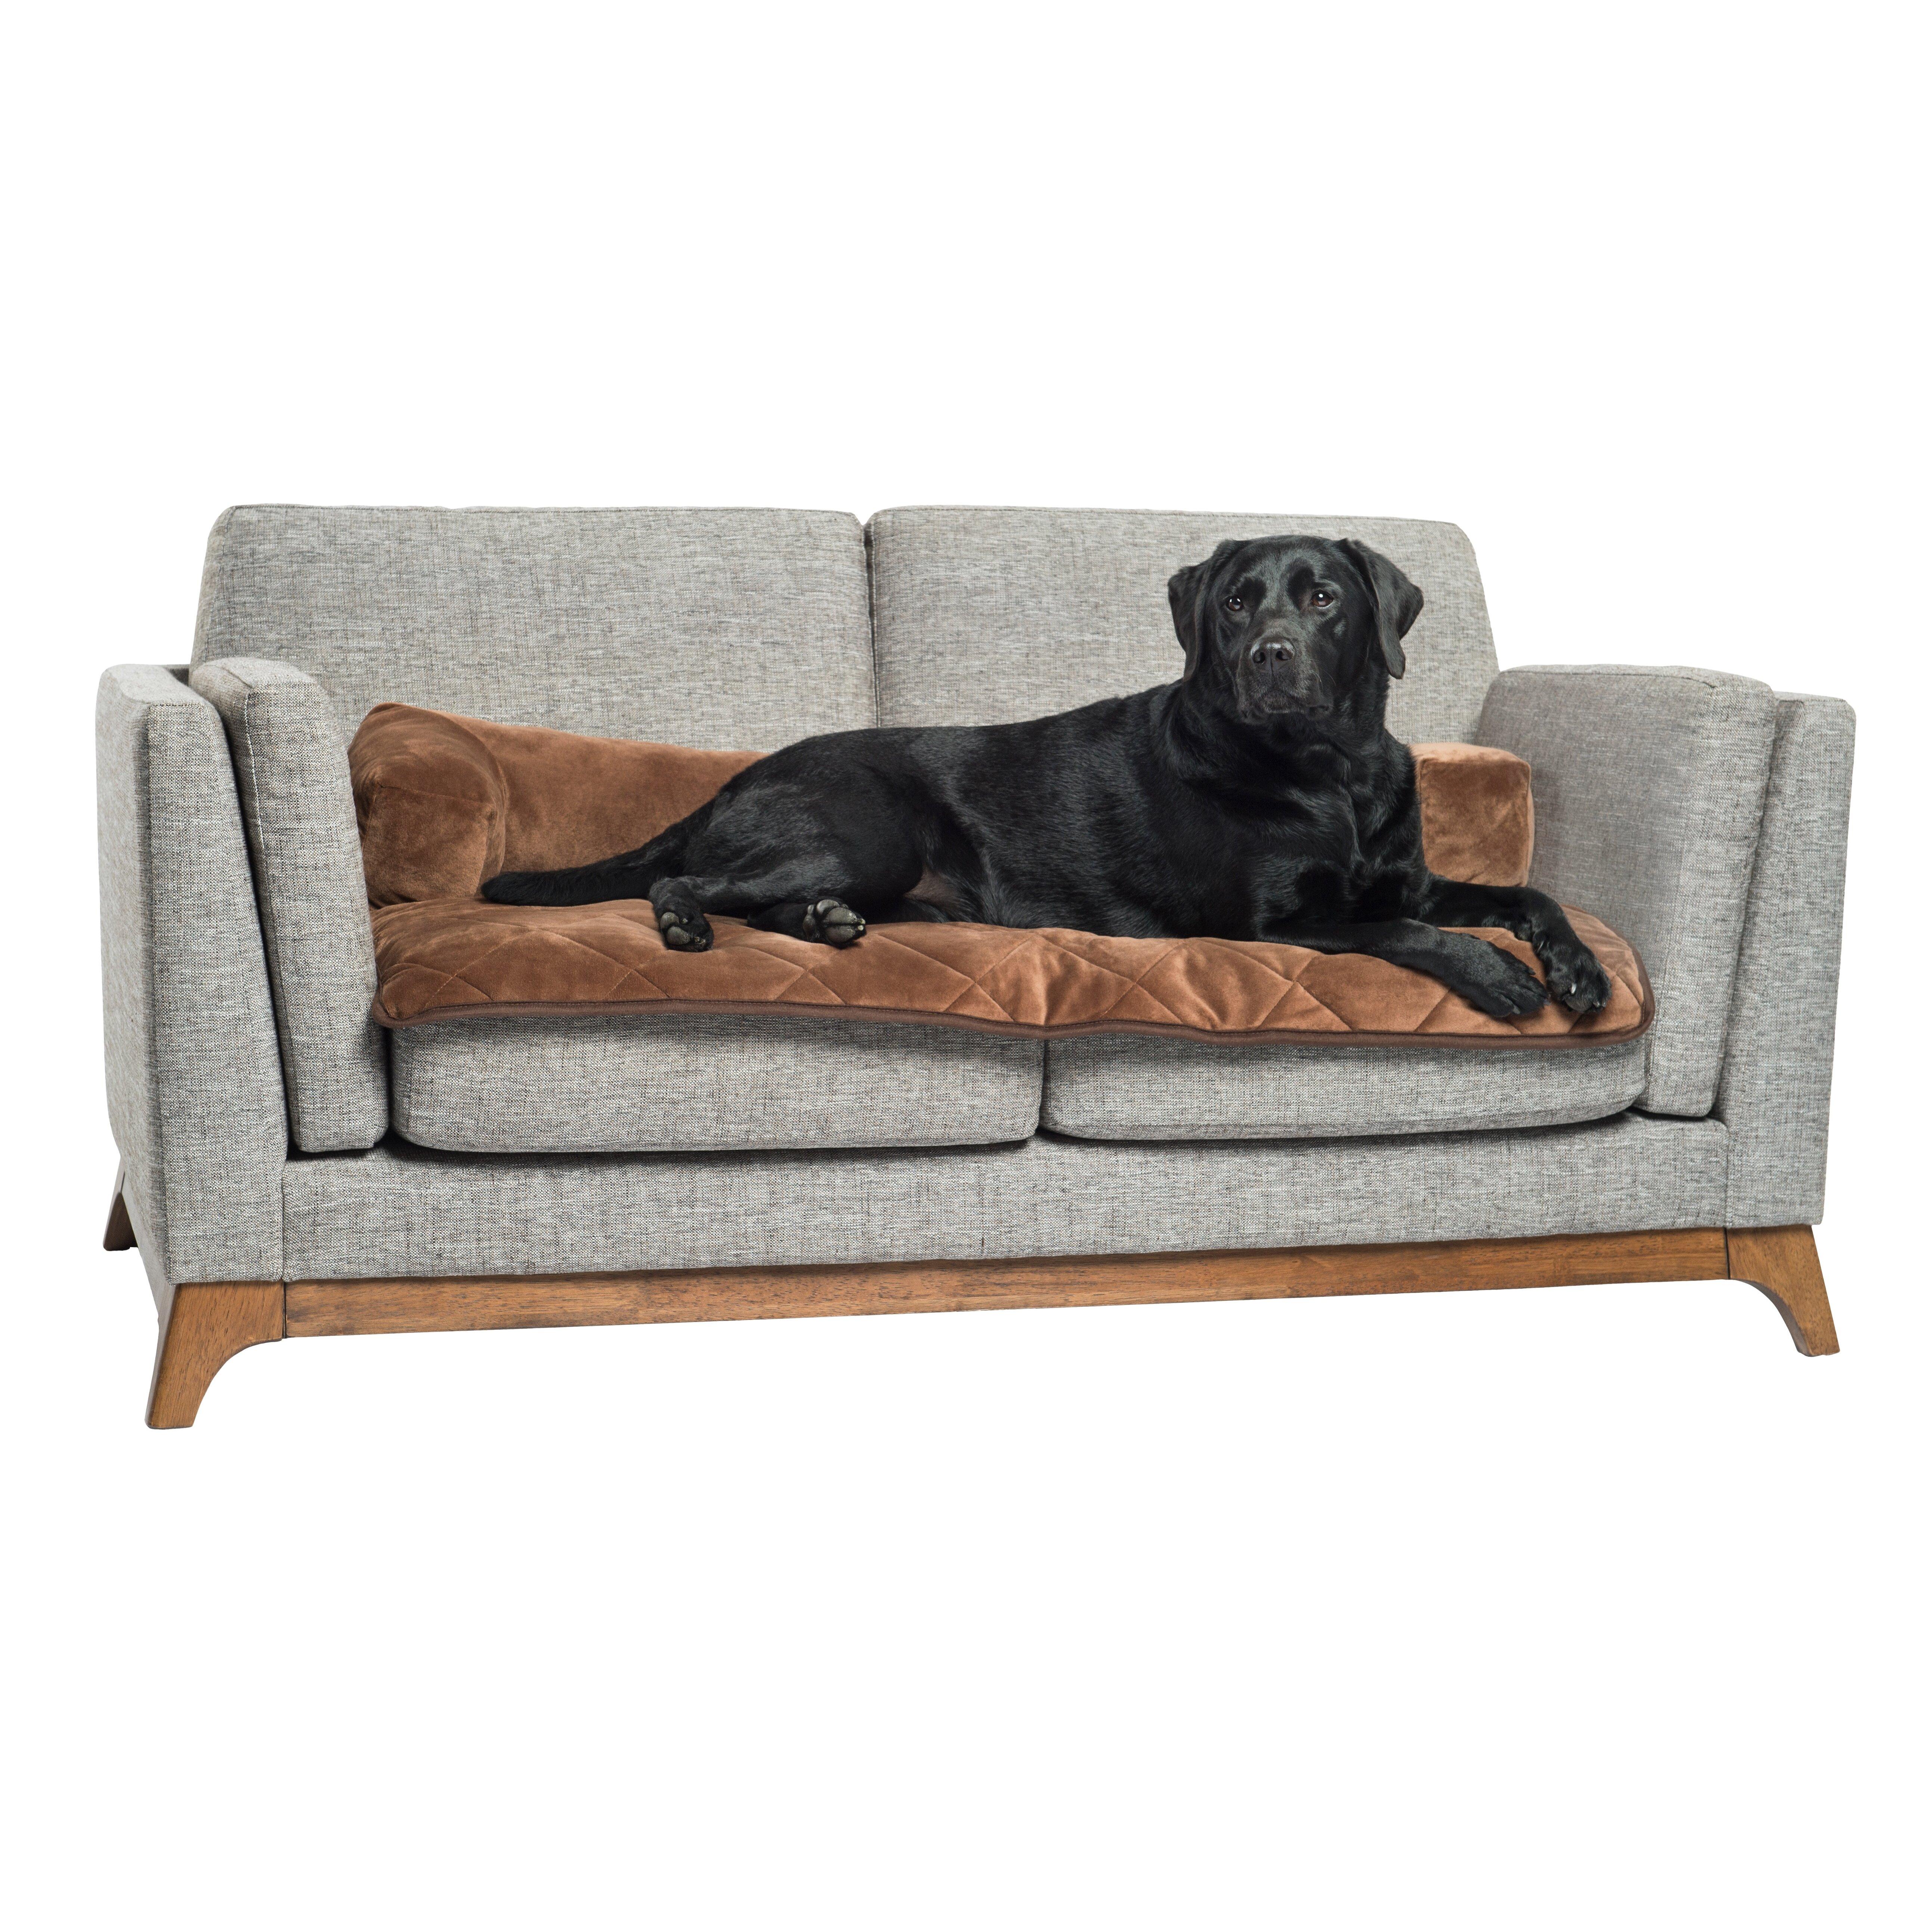 Pettherapeutics Pet Therapeutics Therawarm Self Warming Sofa Bolster Furniture Protector